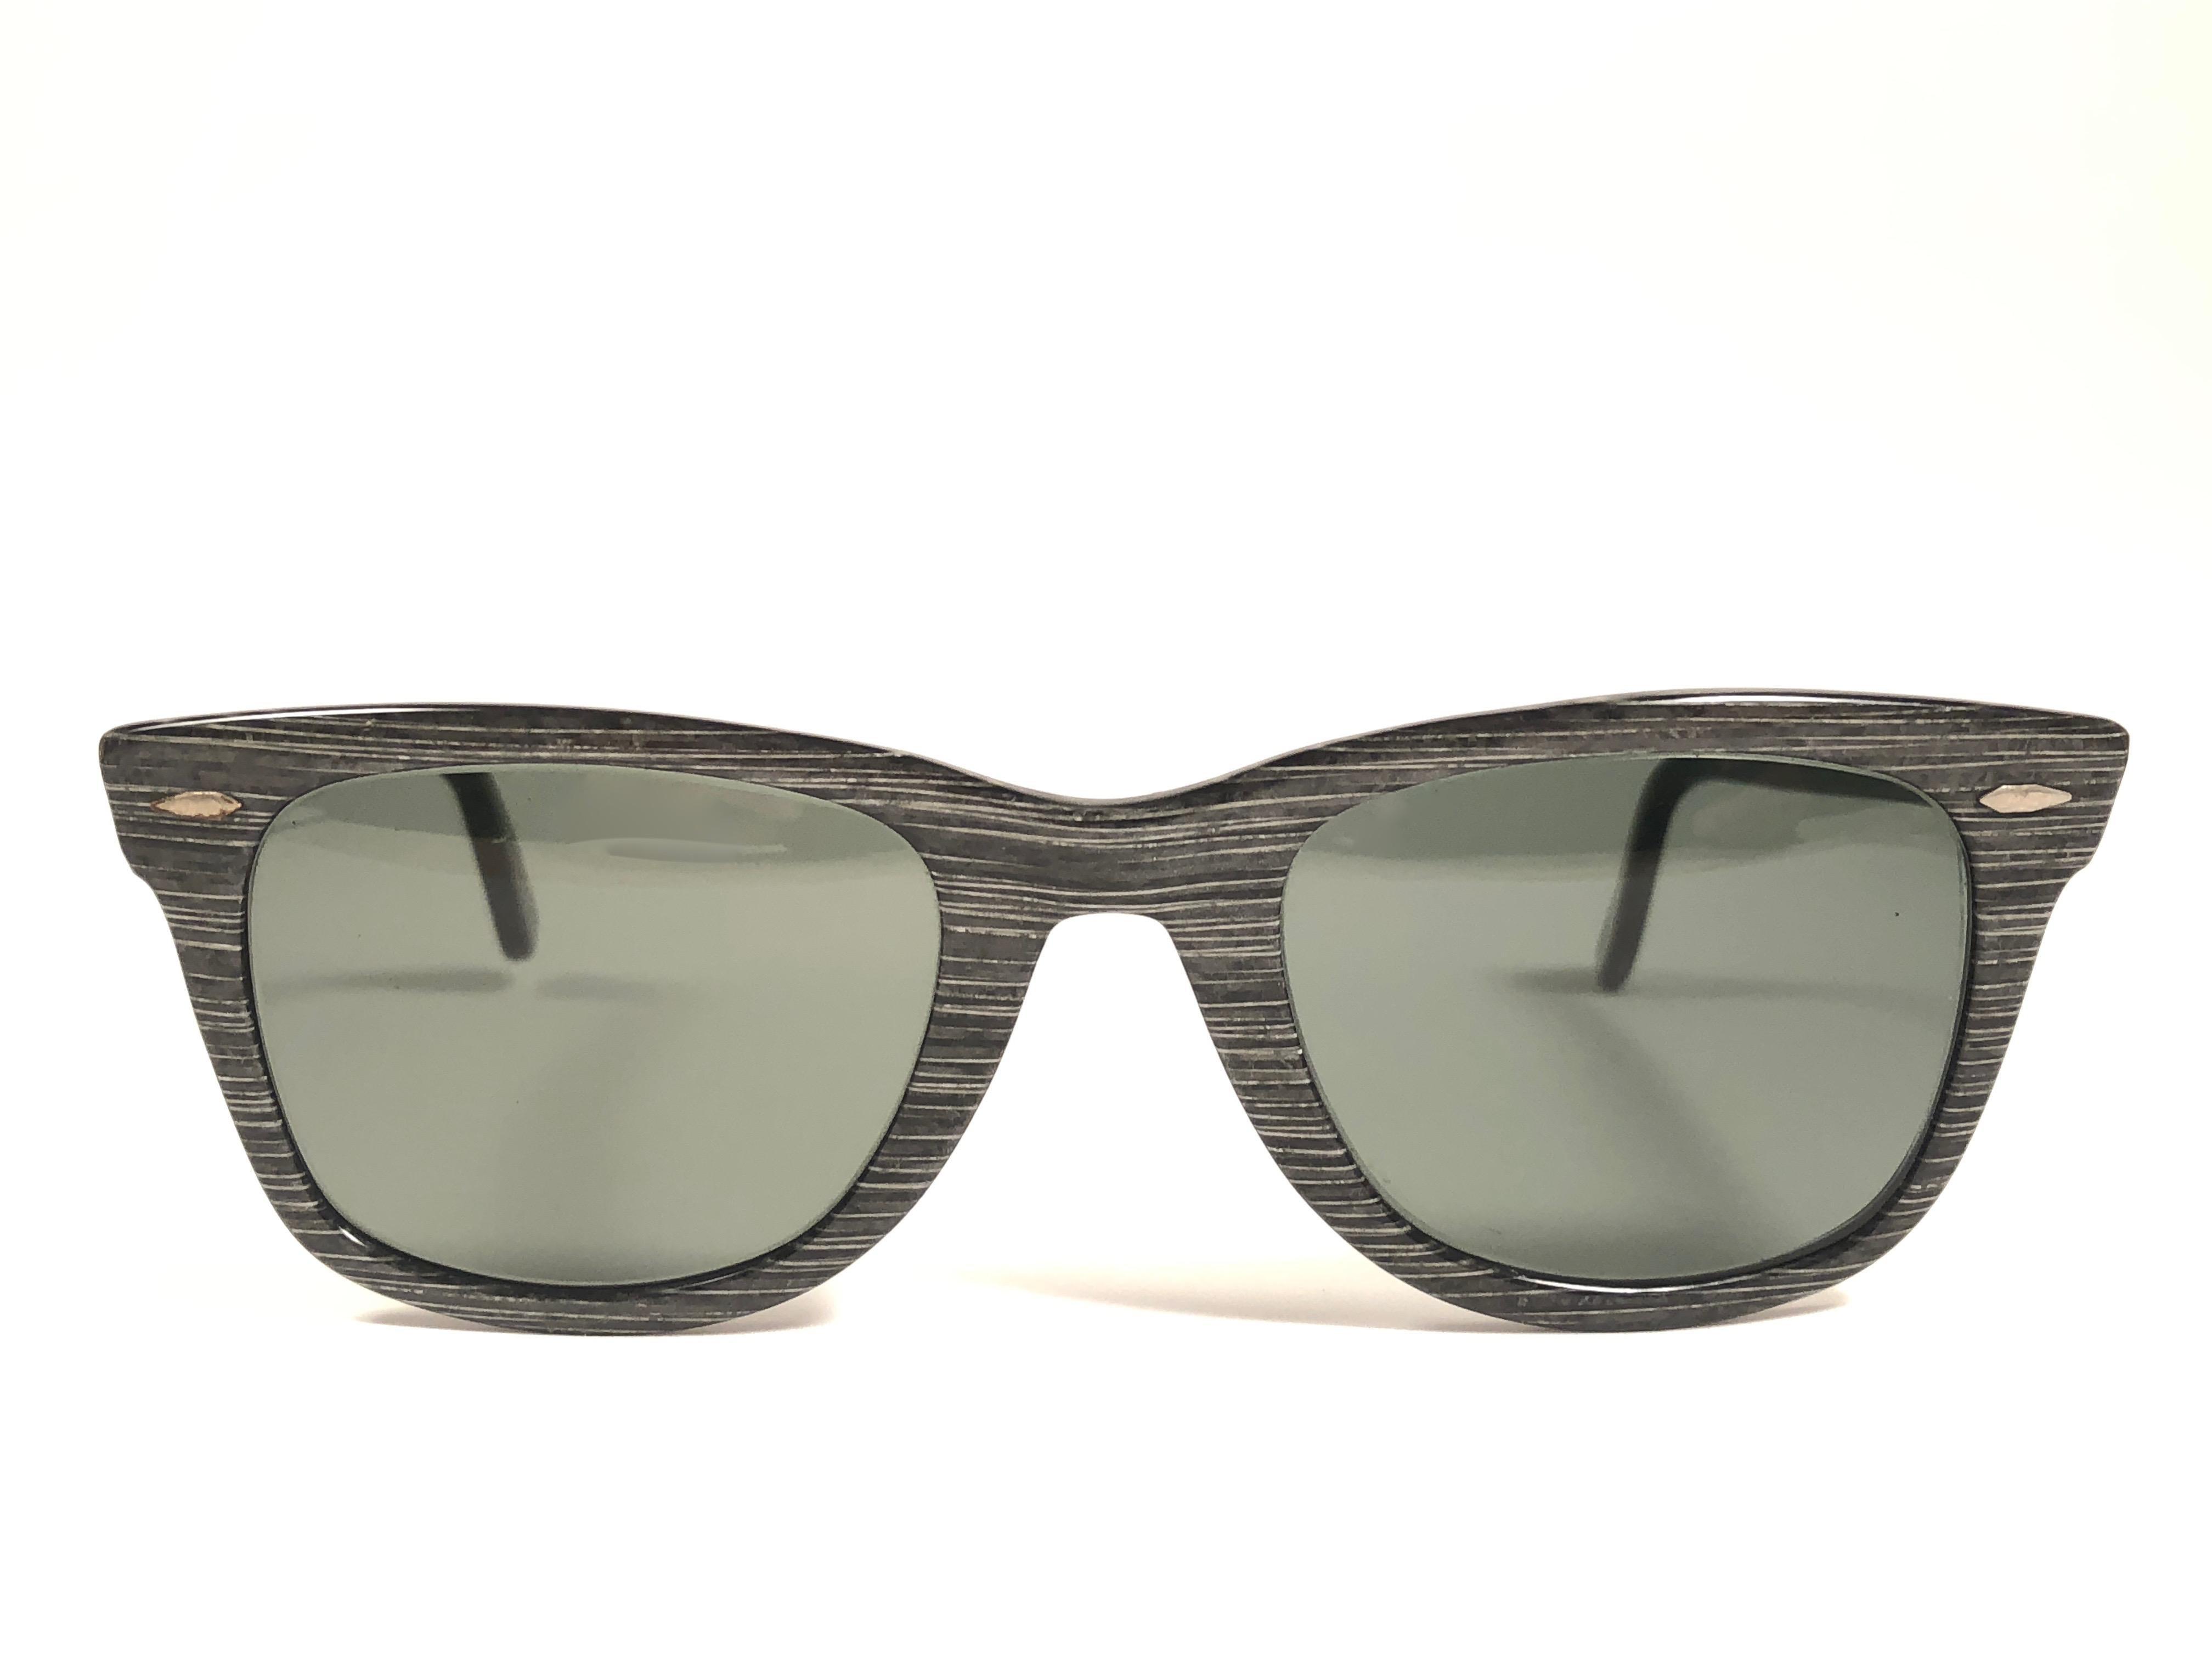 f2809f61c824d New Ray Ban Wayfarer 1960 s Mid Century Black Grey Lenses B L USA  Sunglasses For Sale at 1stdibs